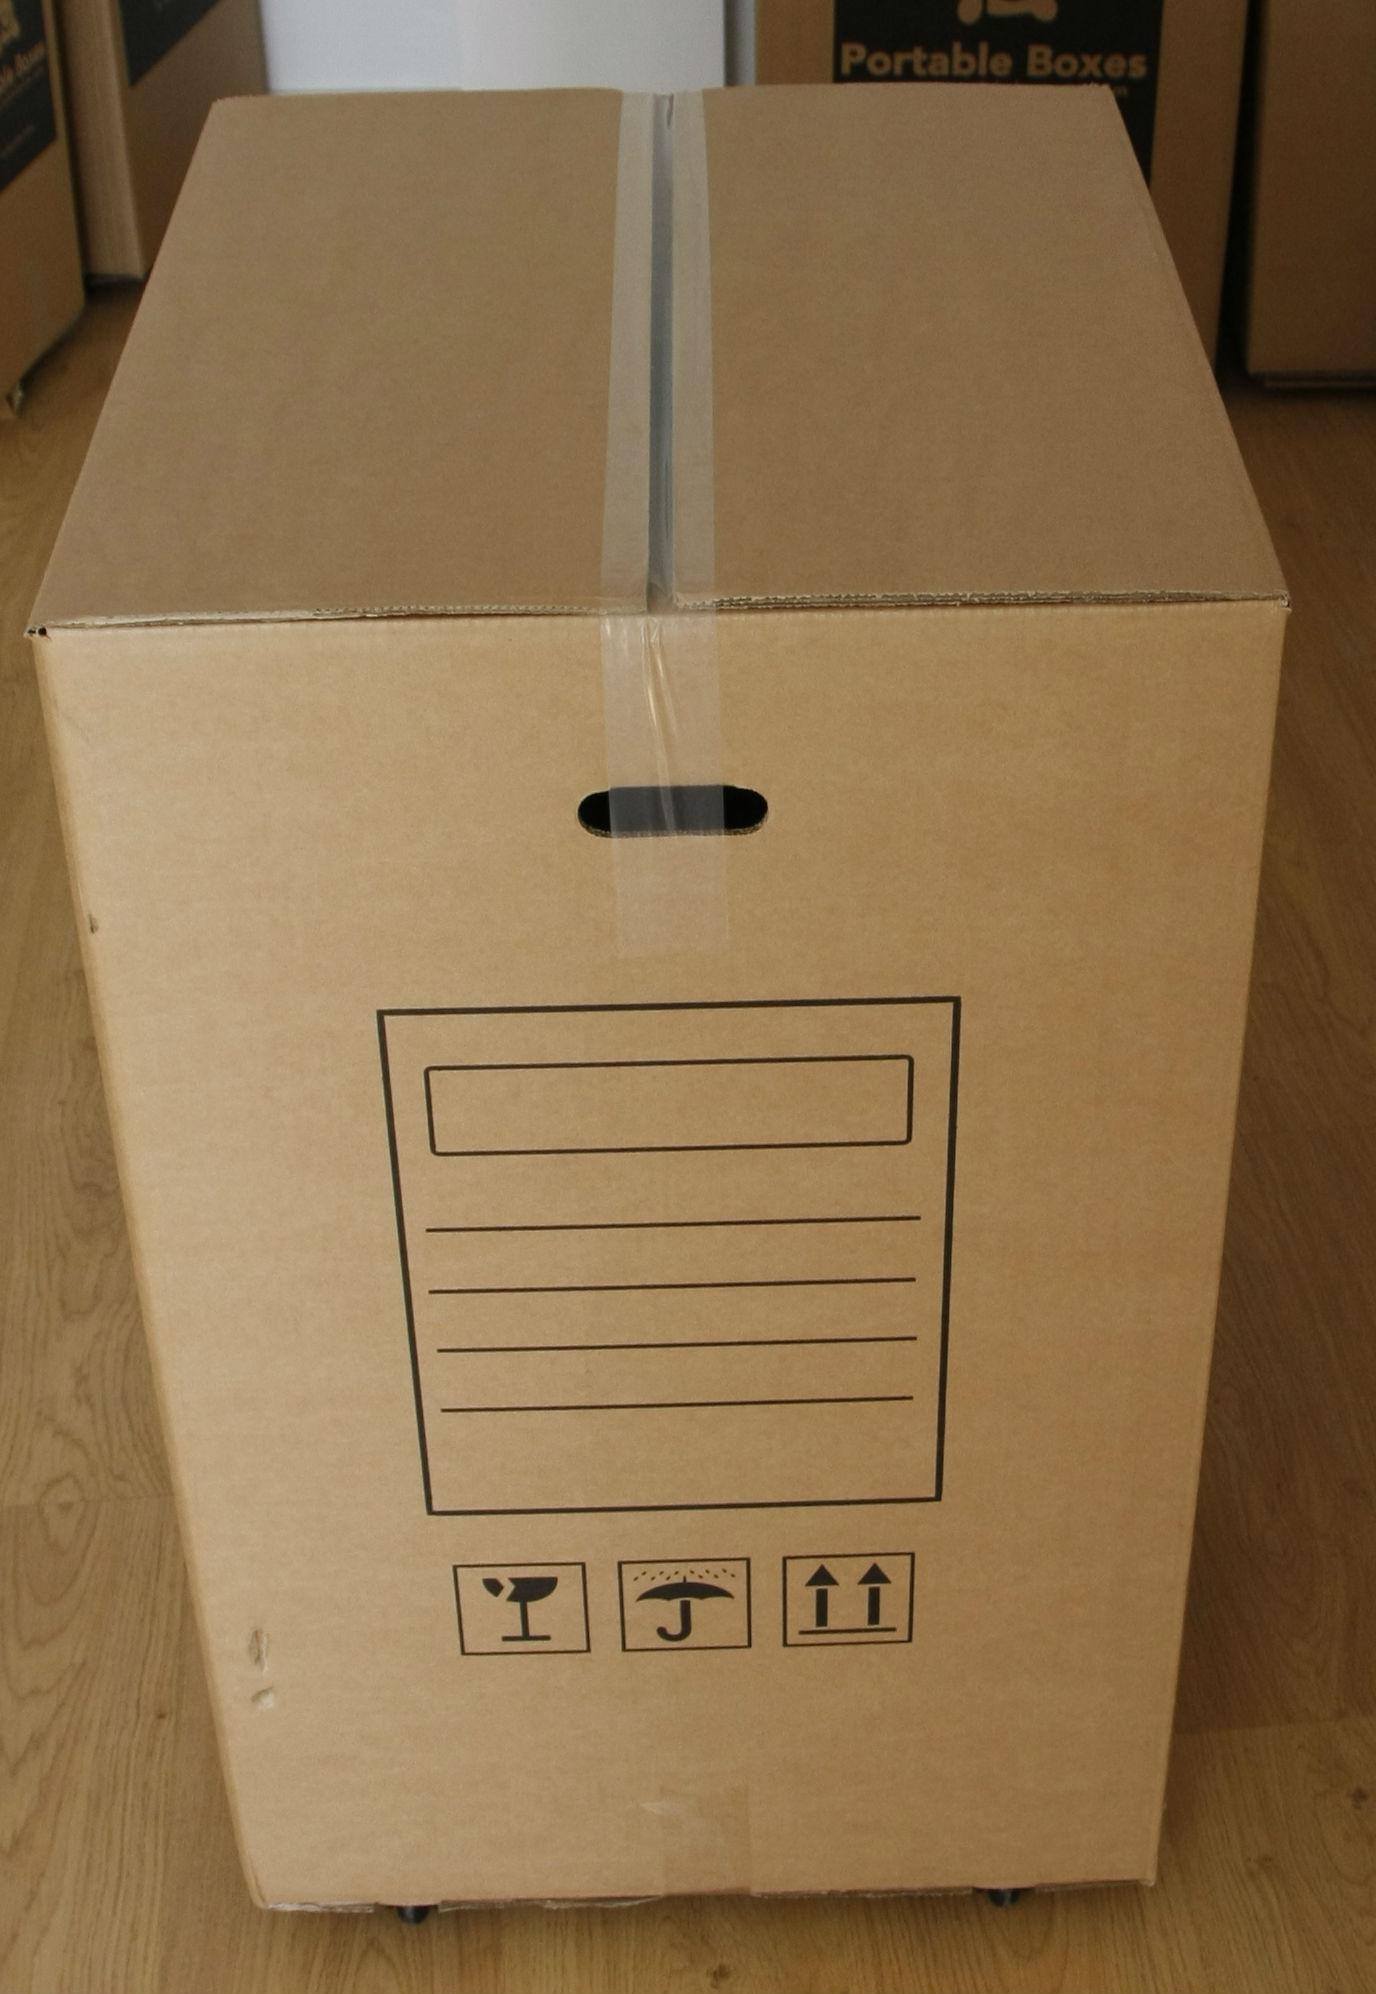 Caja para mudanzas grande con ruedas portable boxes for Cajas de carton para mudanzas